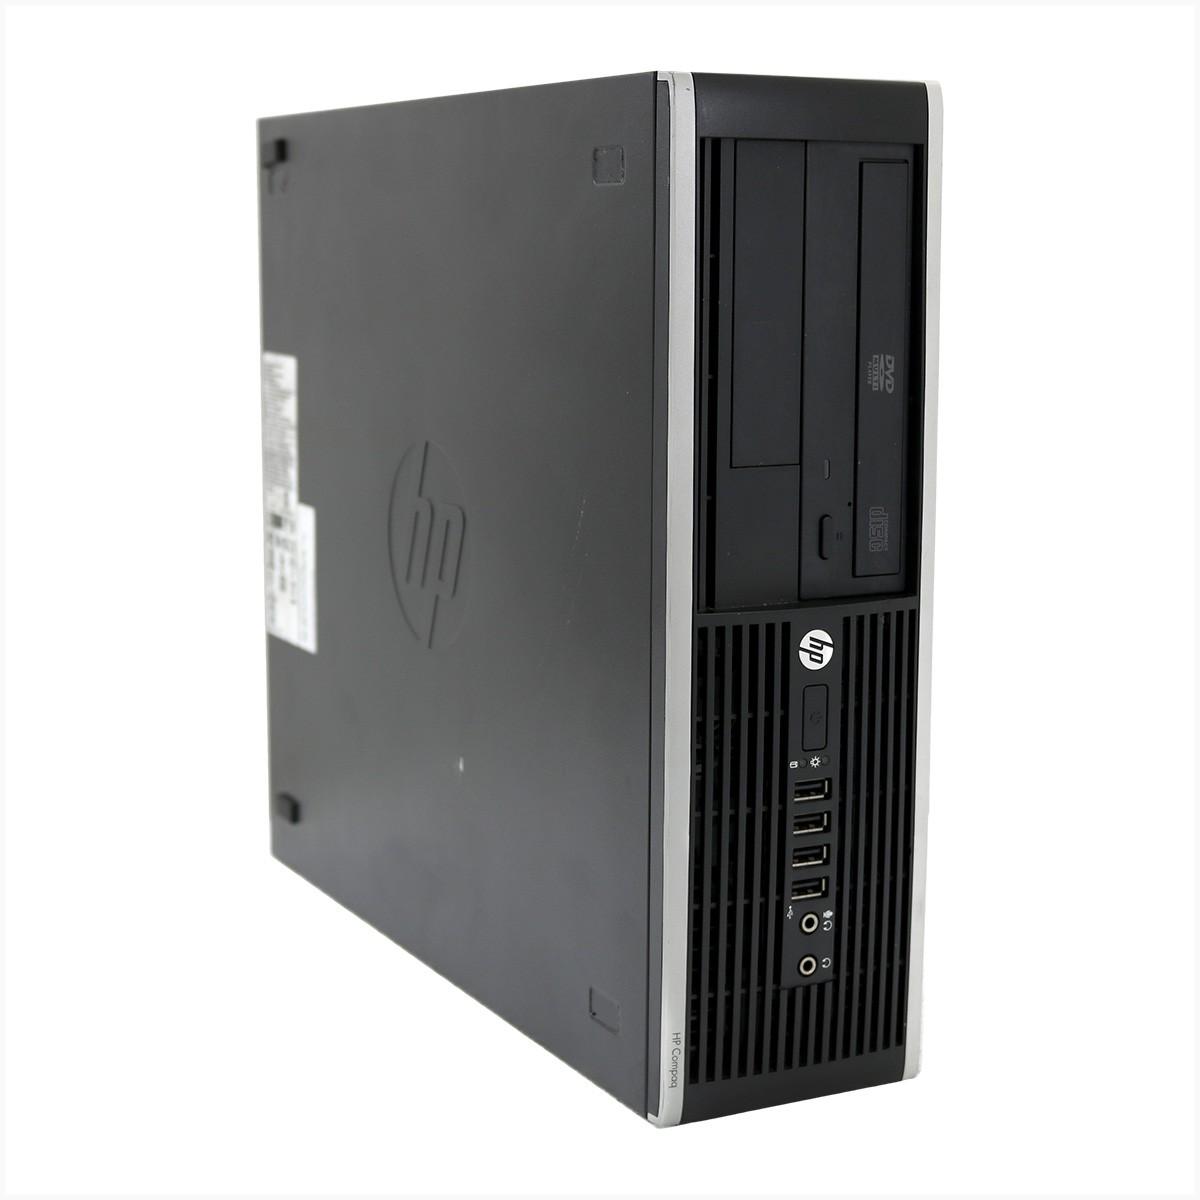 Desktop Hp 6200 Compaq i5 4GB 250GB - Usado